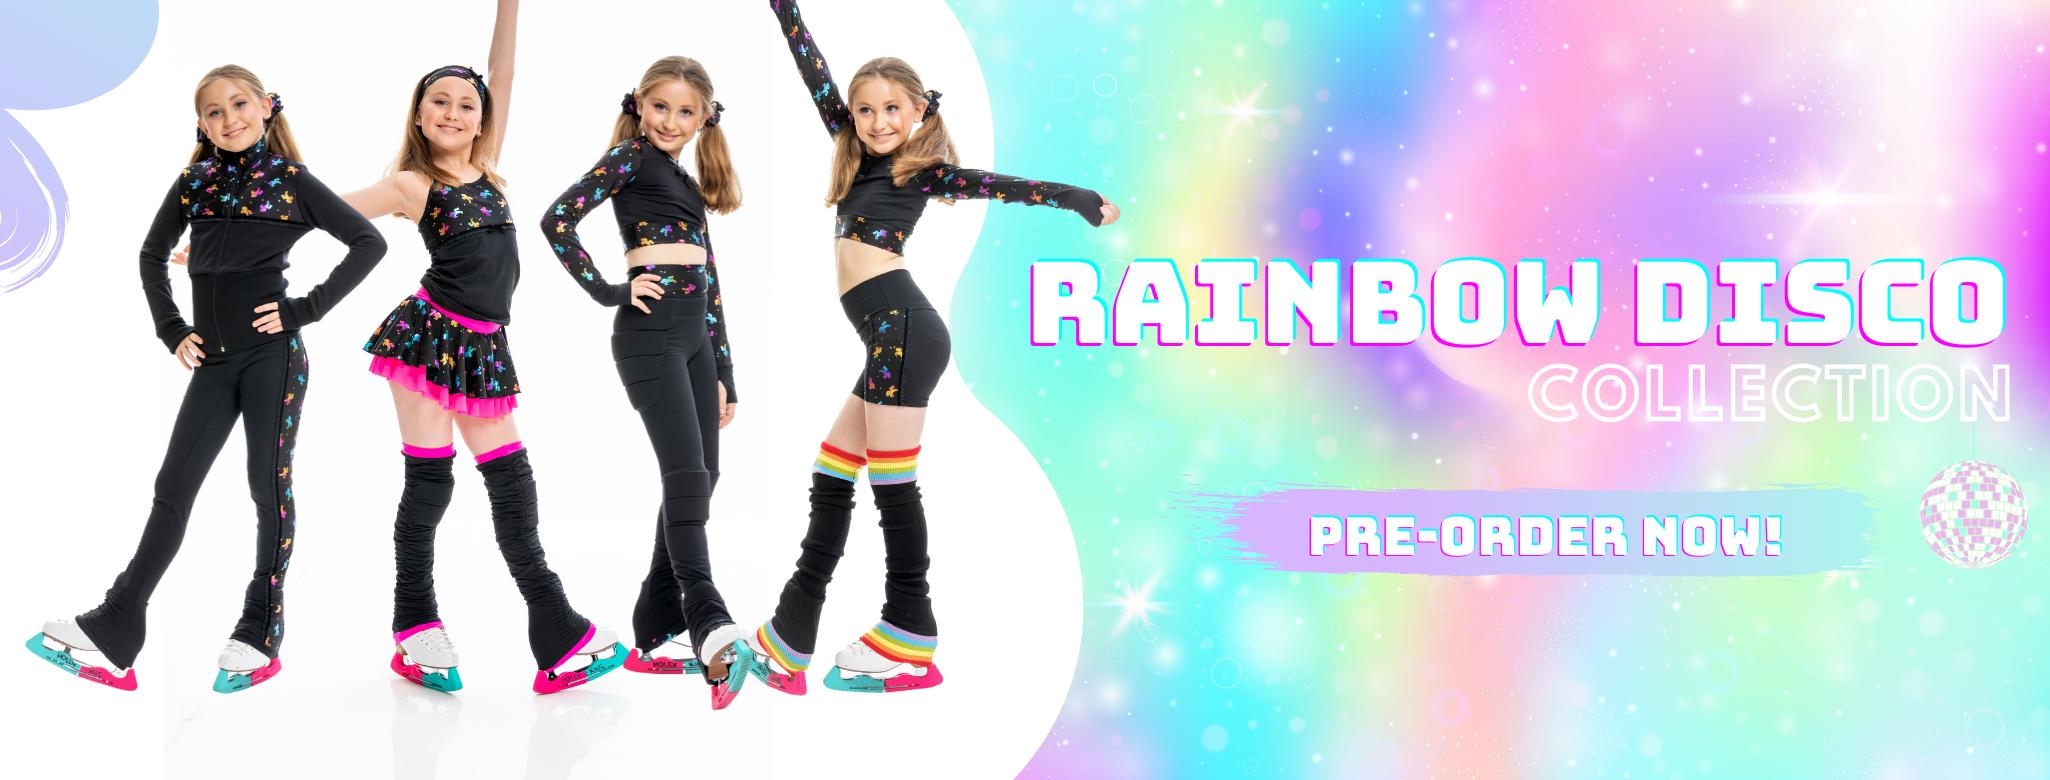 rainbowdisco-unicorn-facebookbanner.png